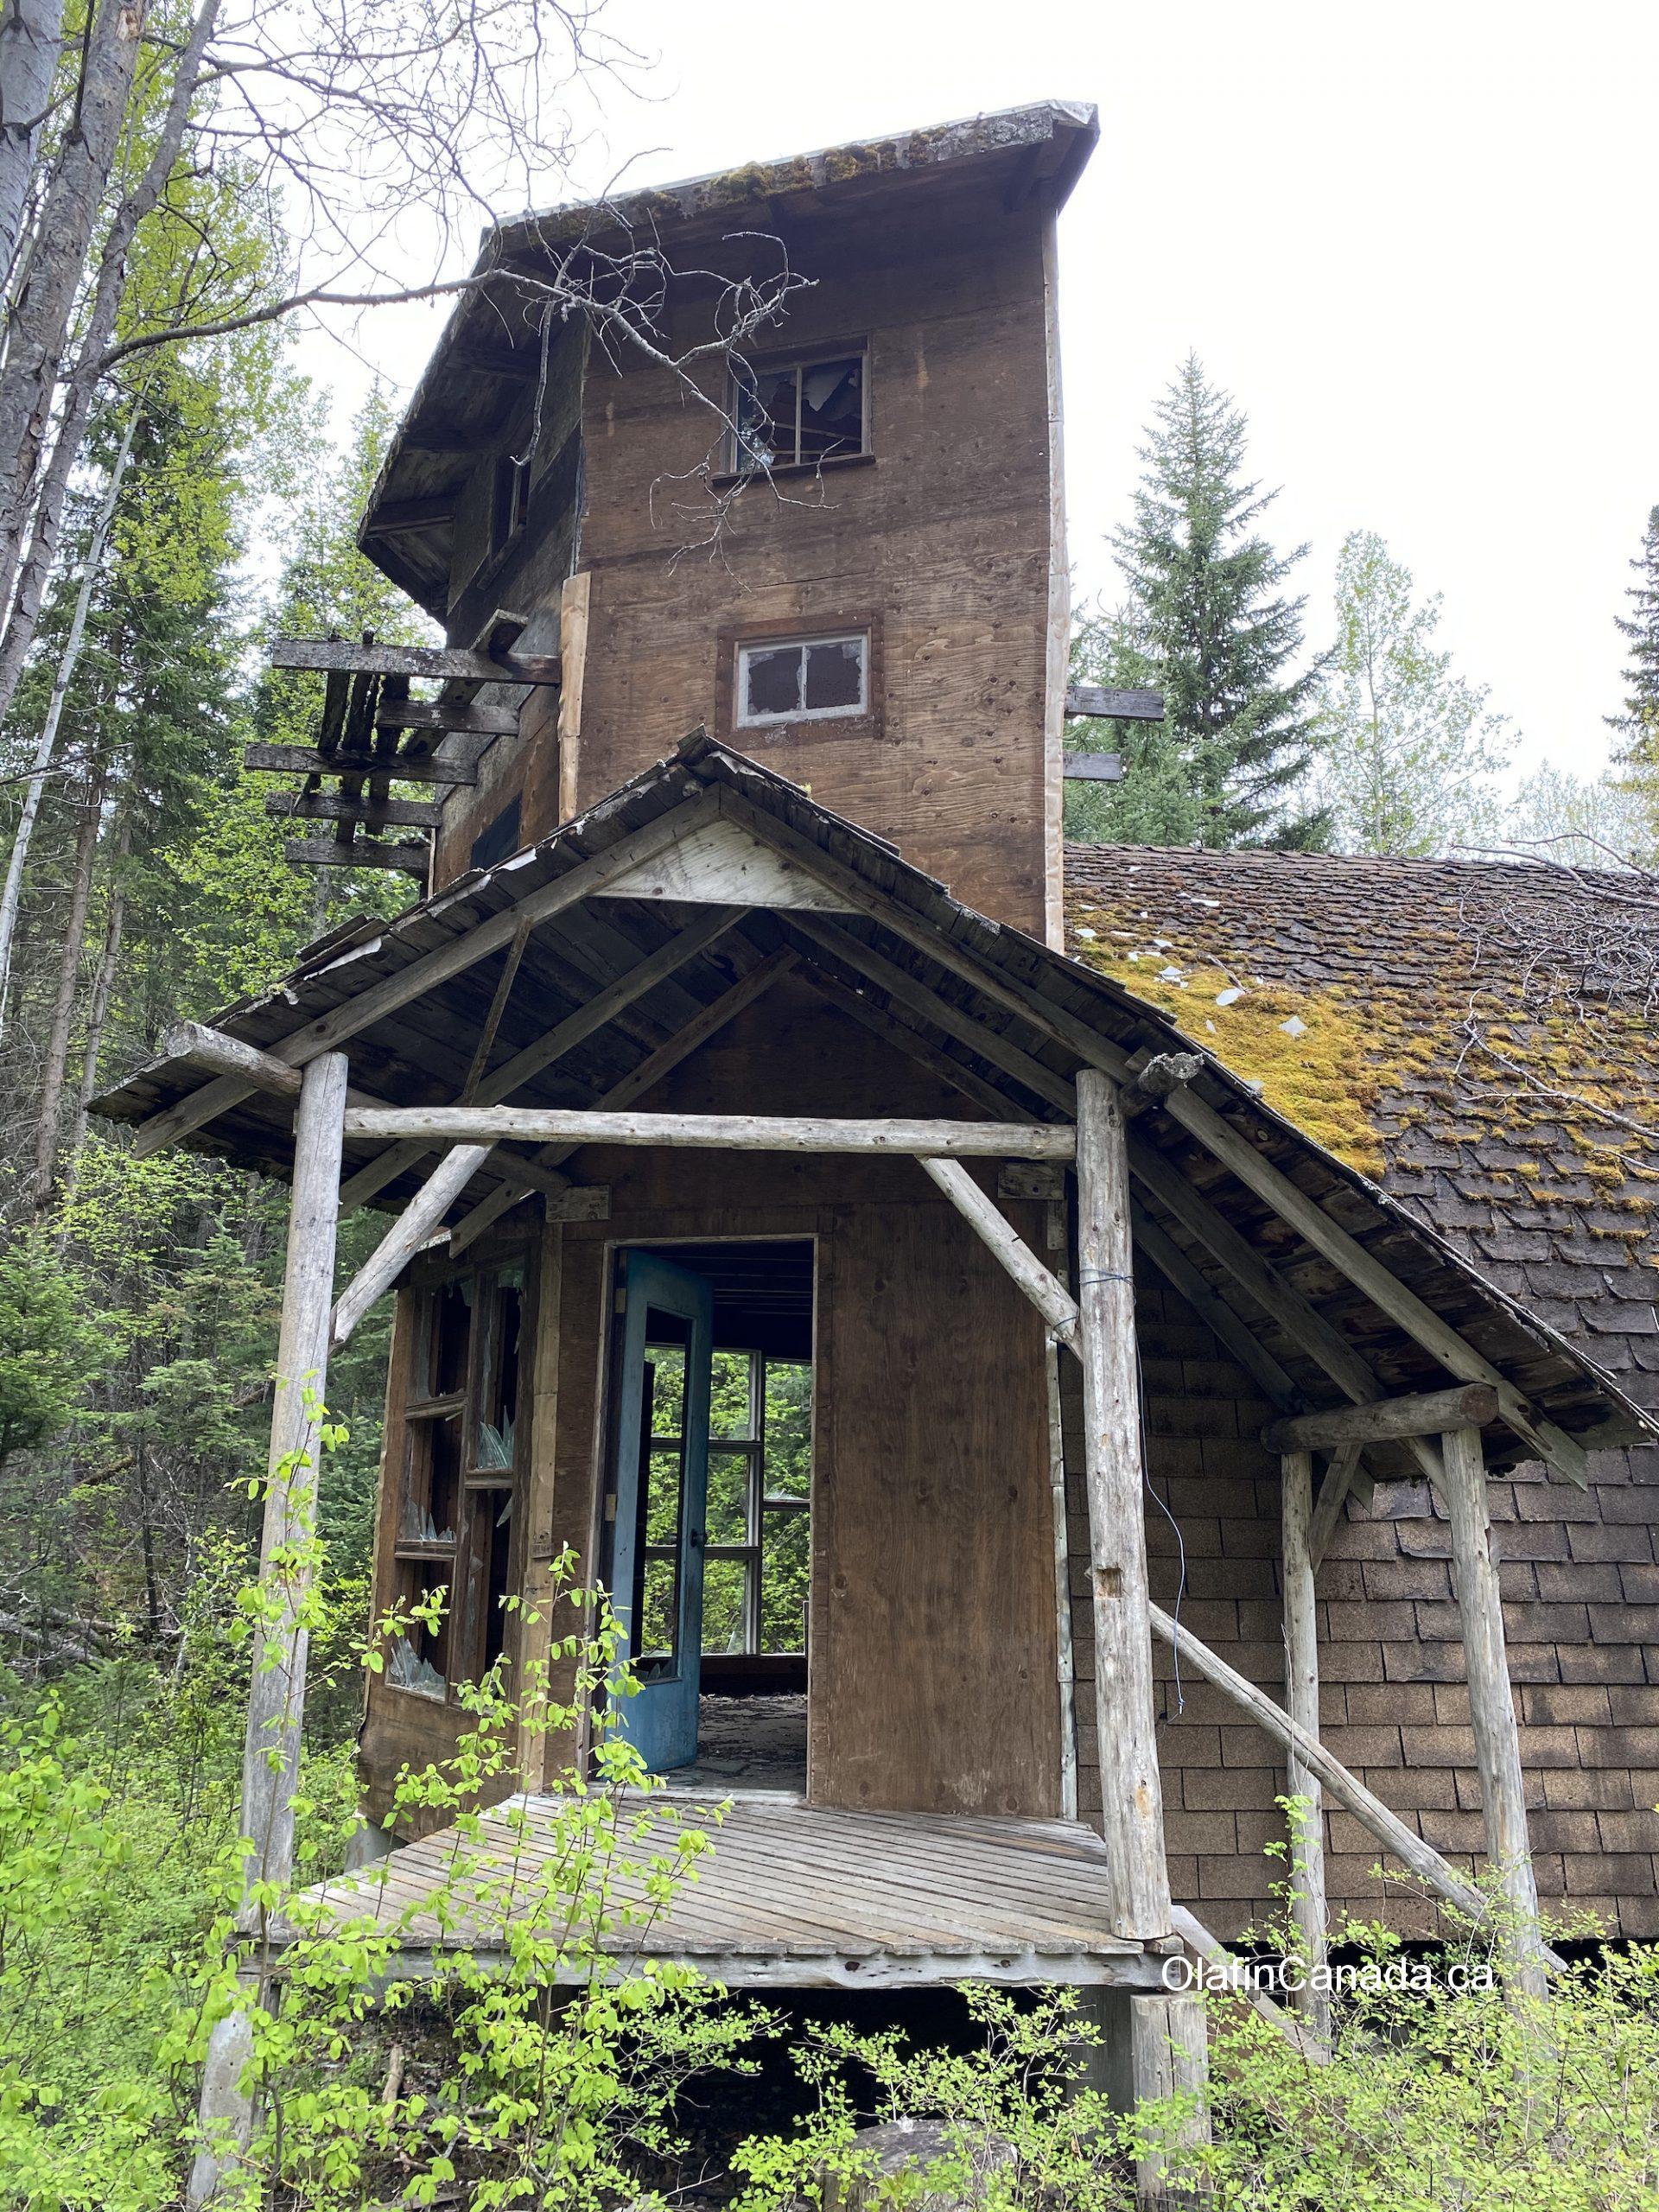 Tower house in Stocks Meadow near West Kelowna. #olafincanada #britishcolumbia #discoverbc #abandonedbc #stocksmeadow #hippies